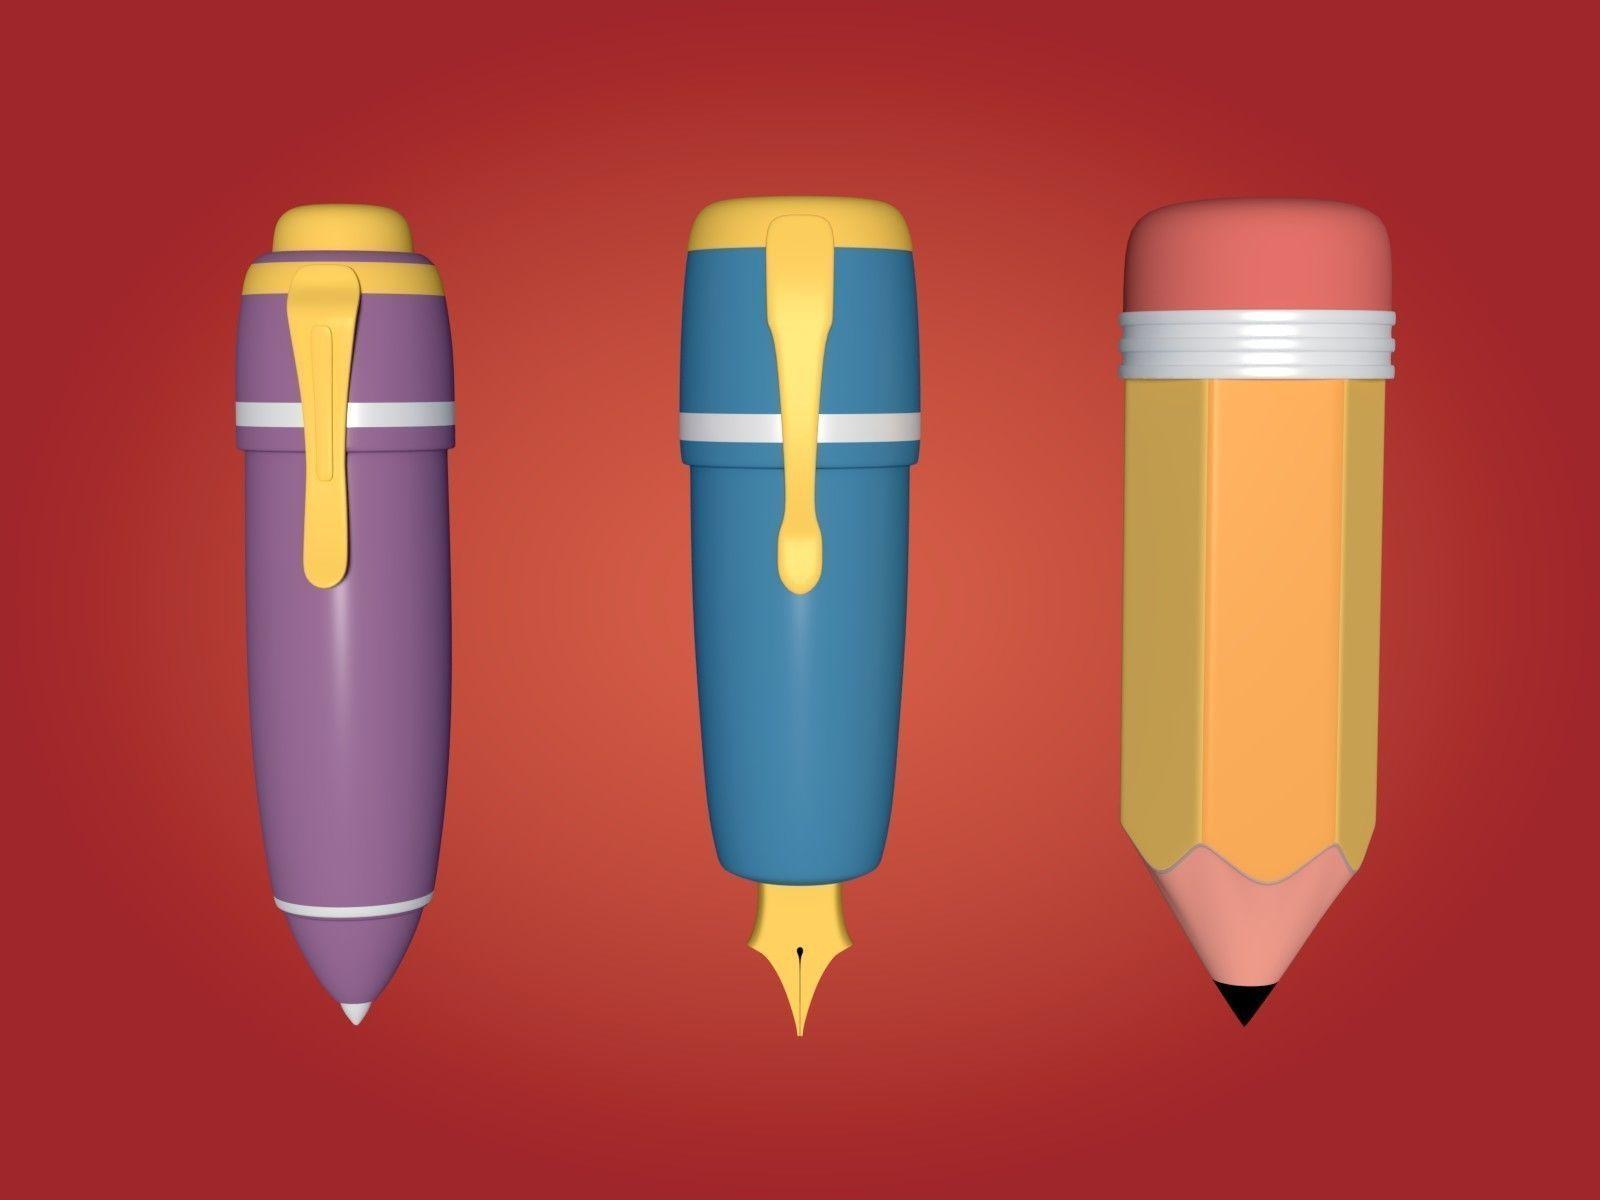 Cartoon Pencil and Pens